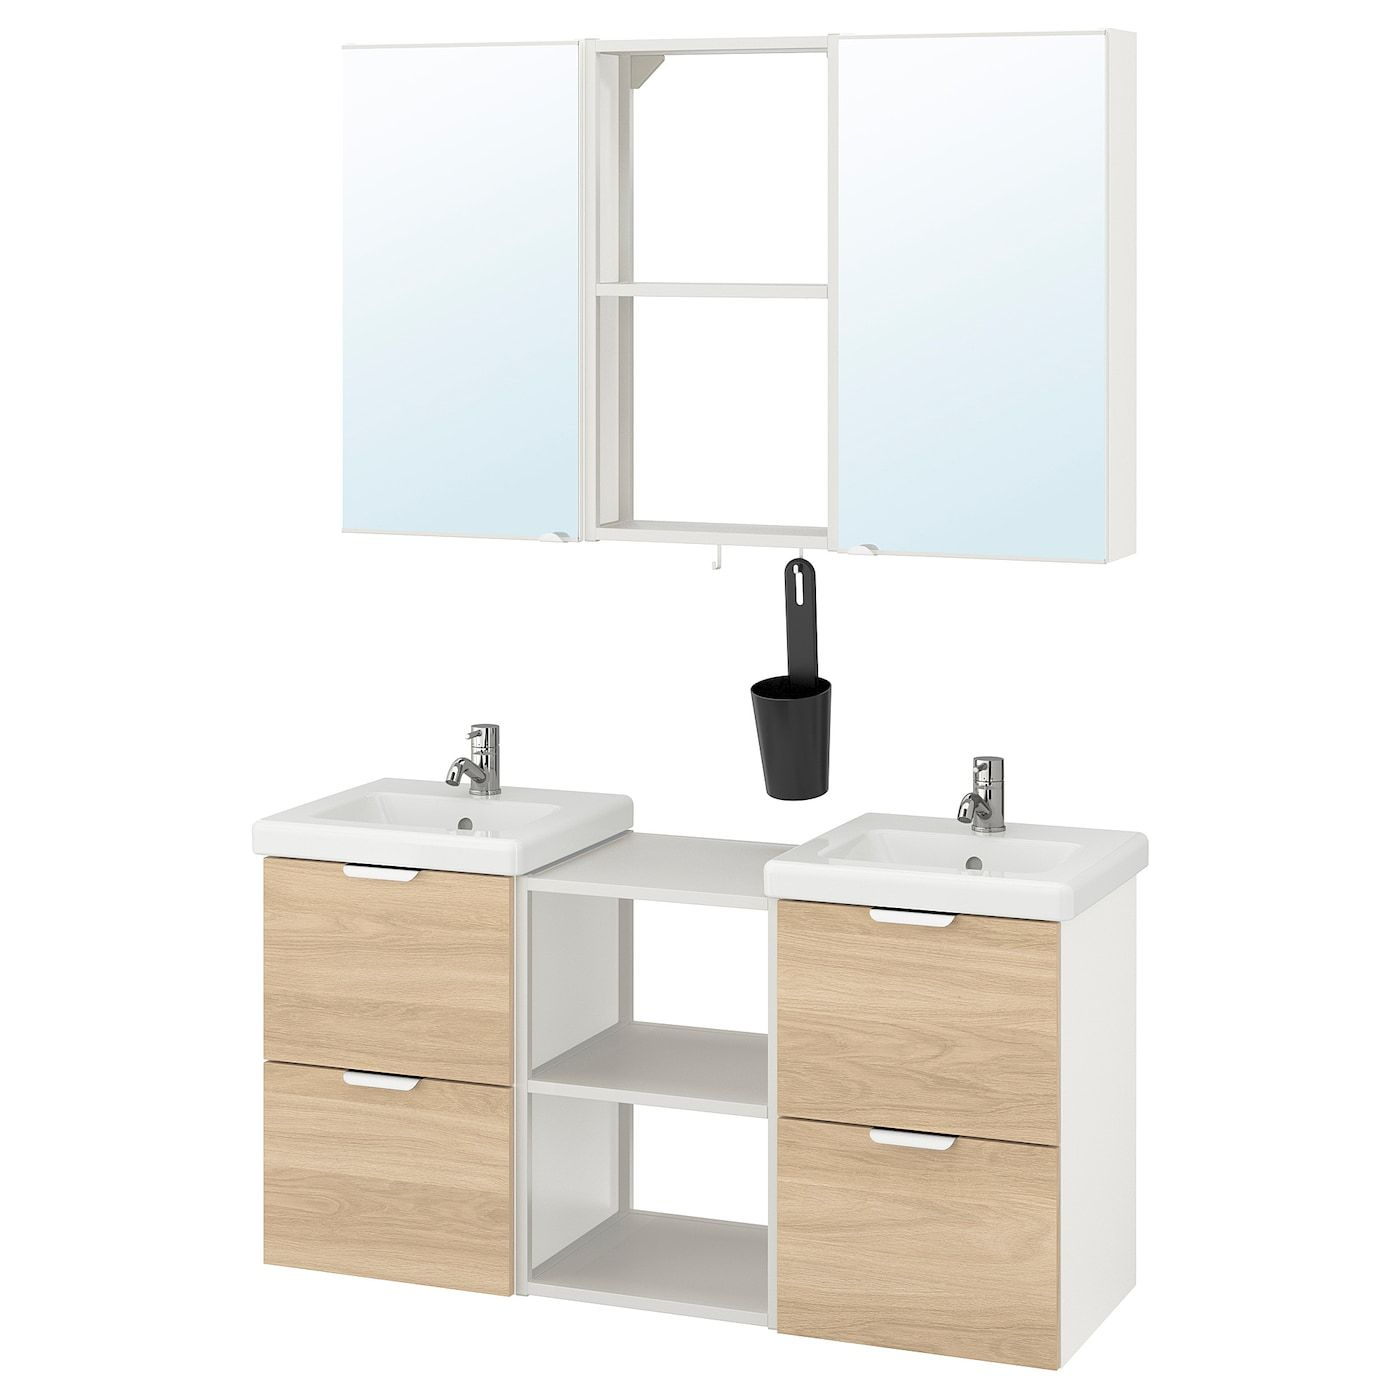 IKEA ENHET / TVÄLLEN Bathroom furniture, 22 pieces